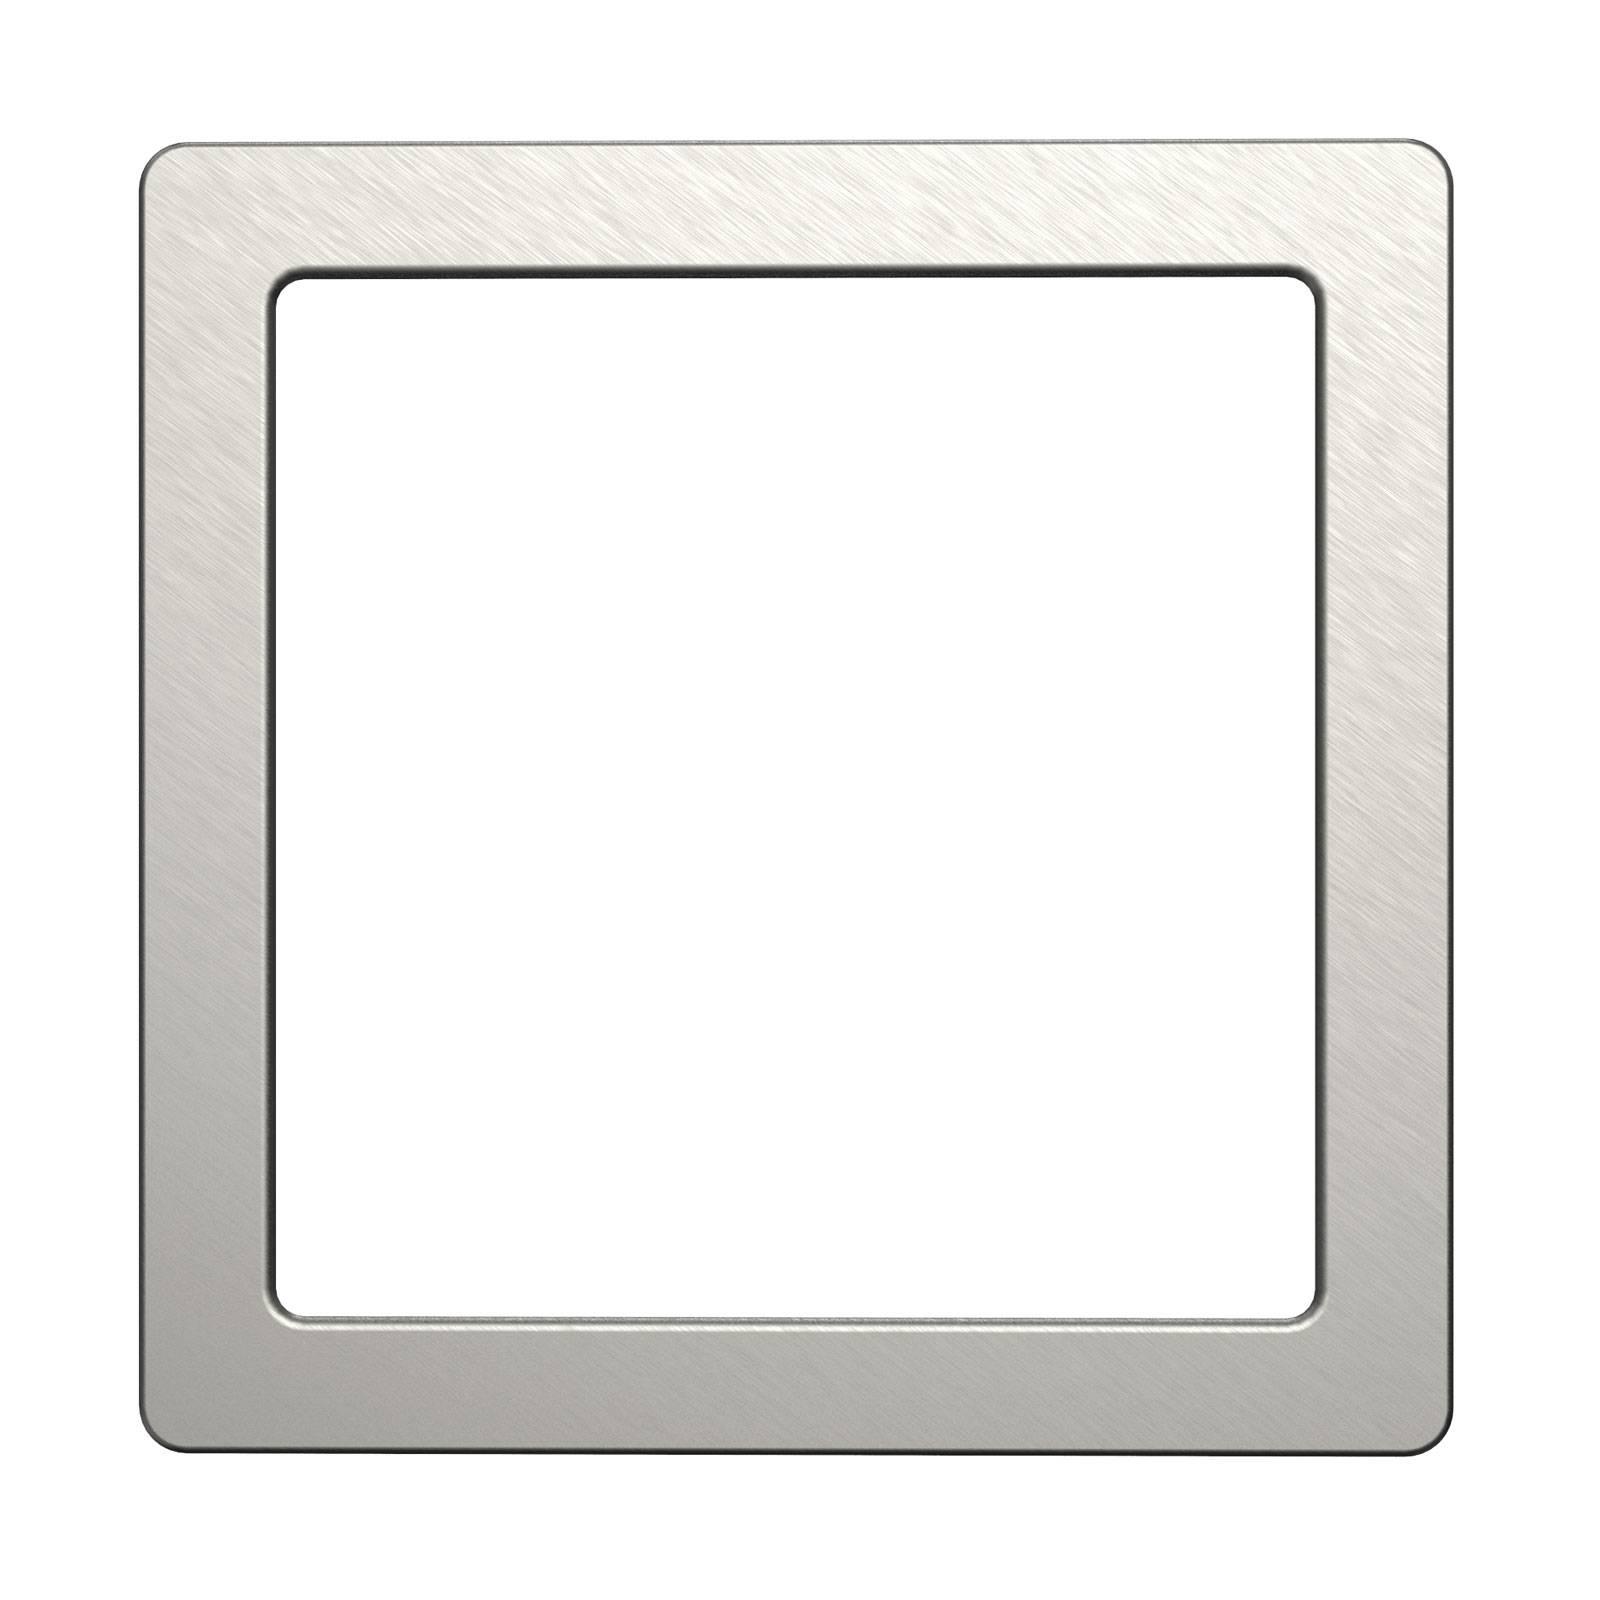 Megatron Pano magnetic cover angular Ø 14 cm